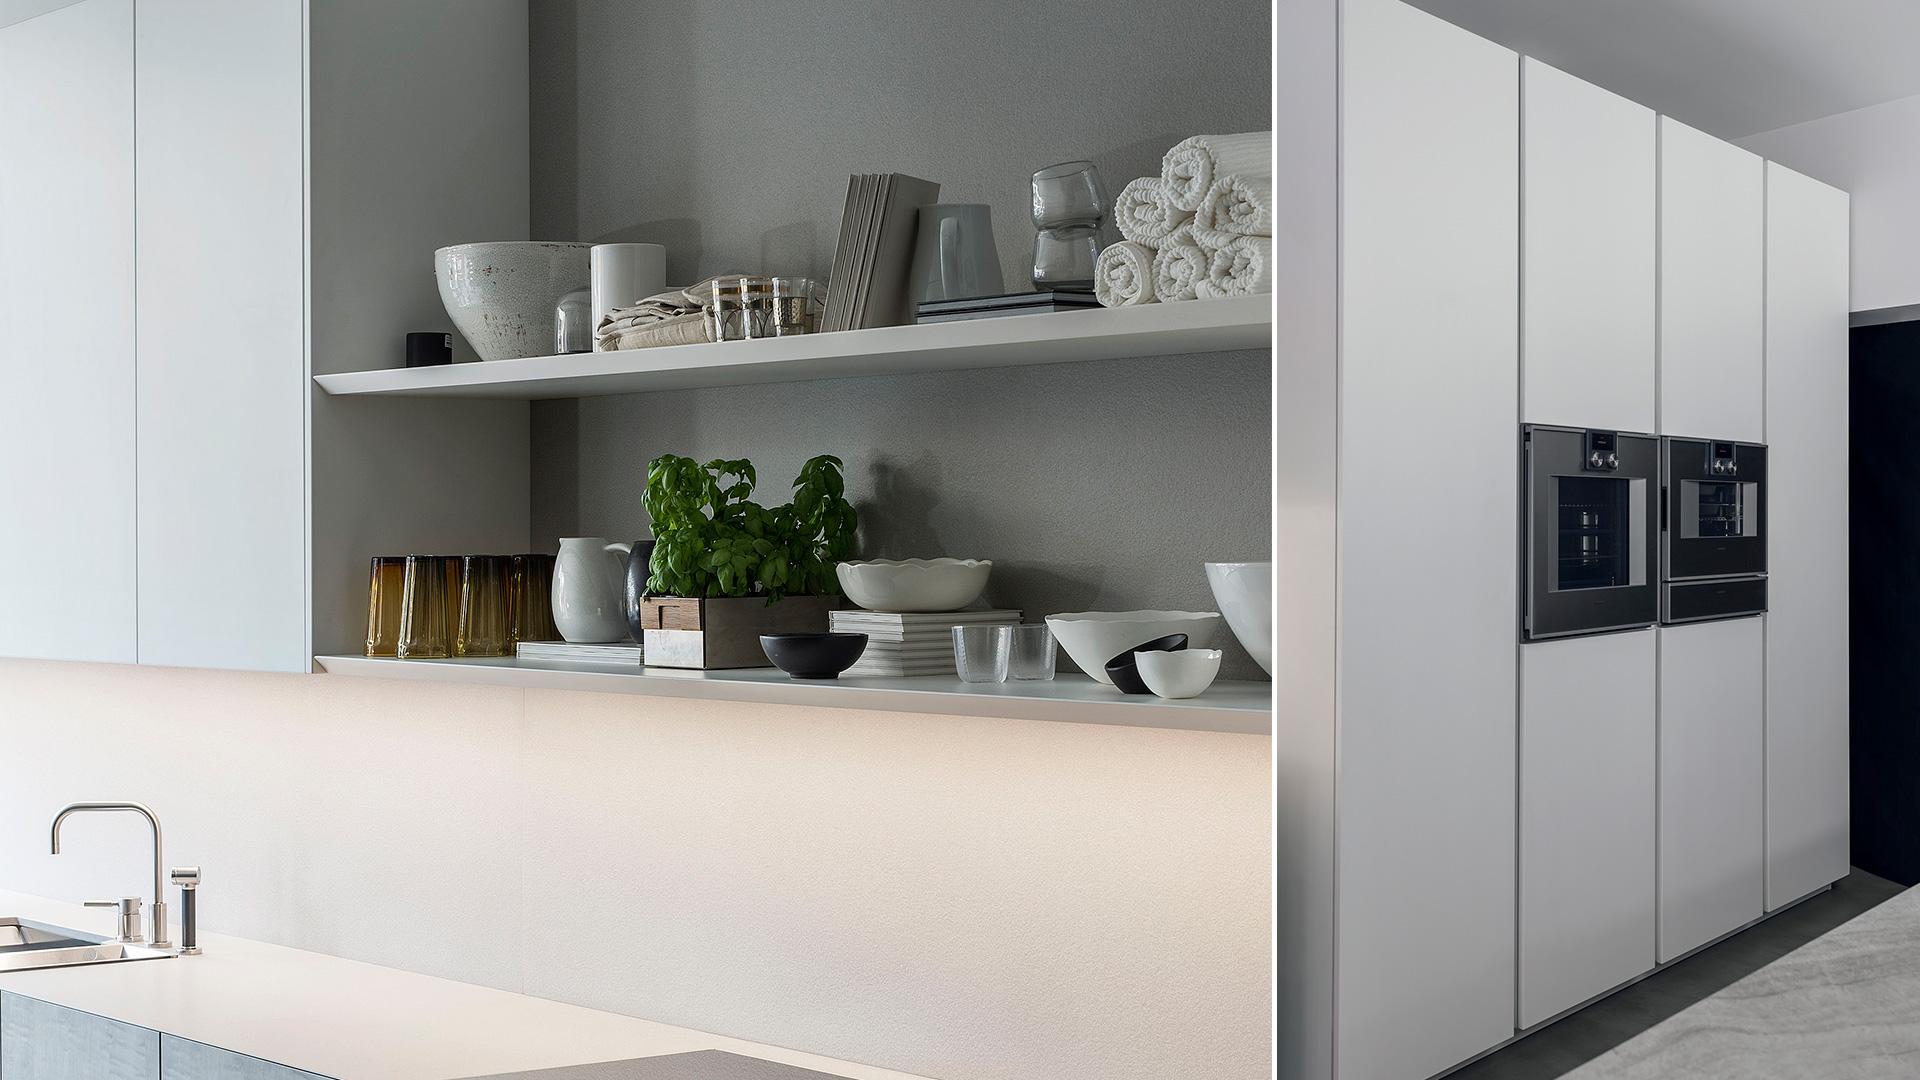 Linear Kitchen with sycamore and quartz - TM_LN17_LAUREN_T45-EVO_004-b